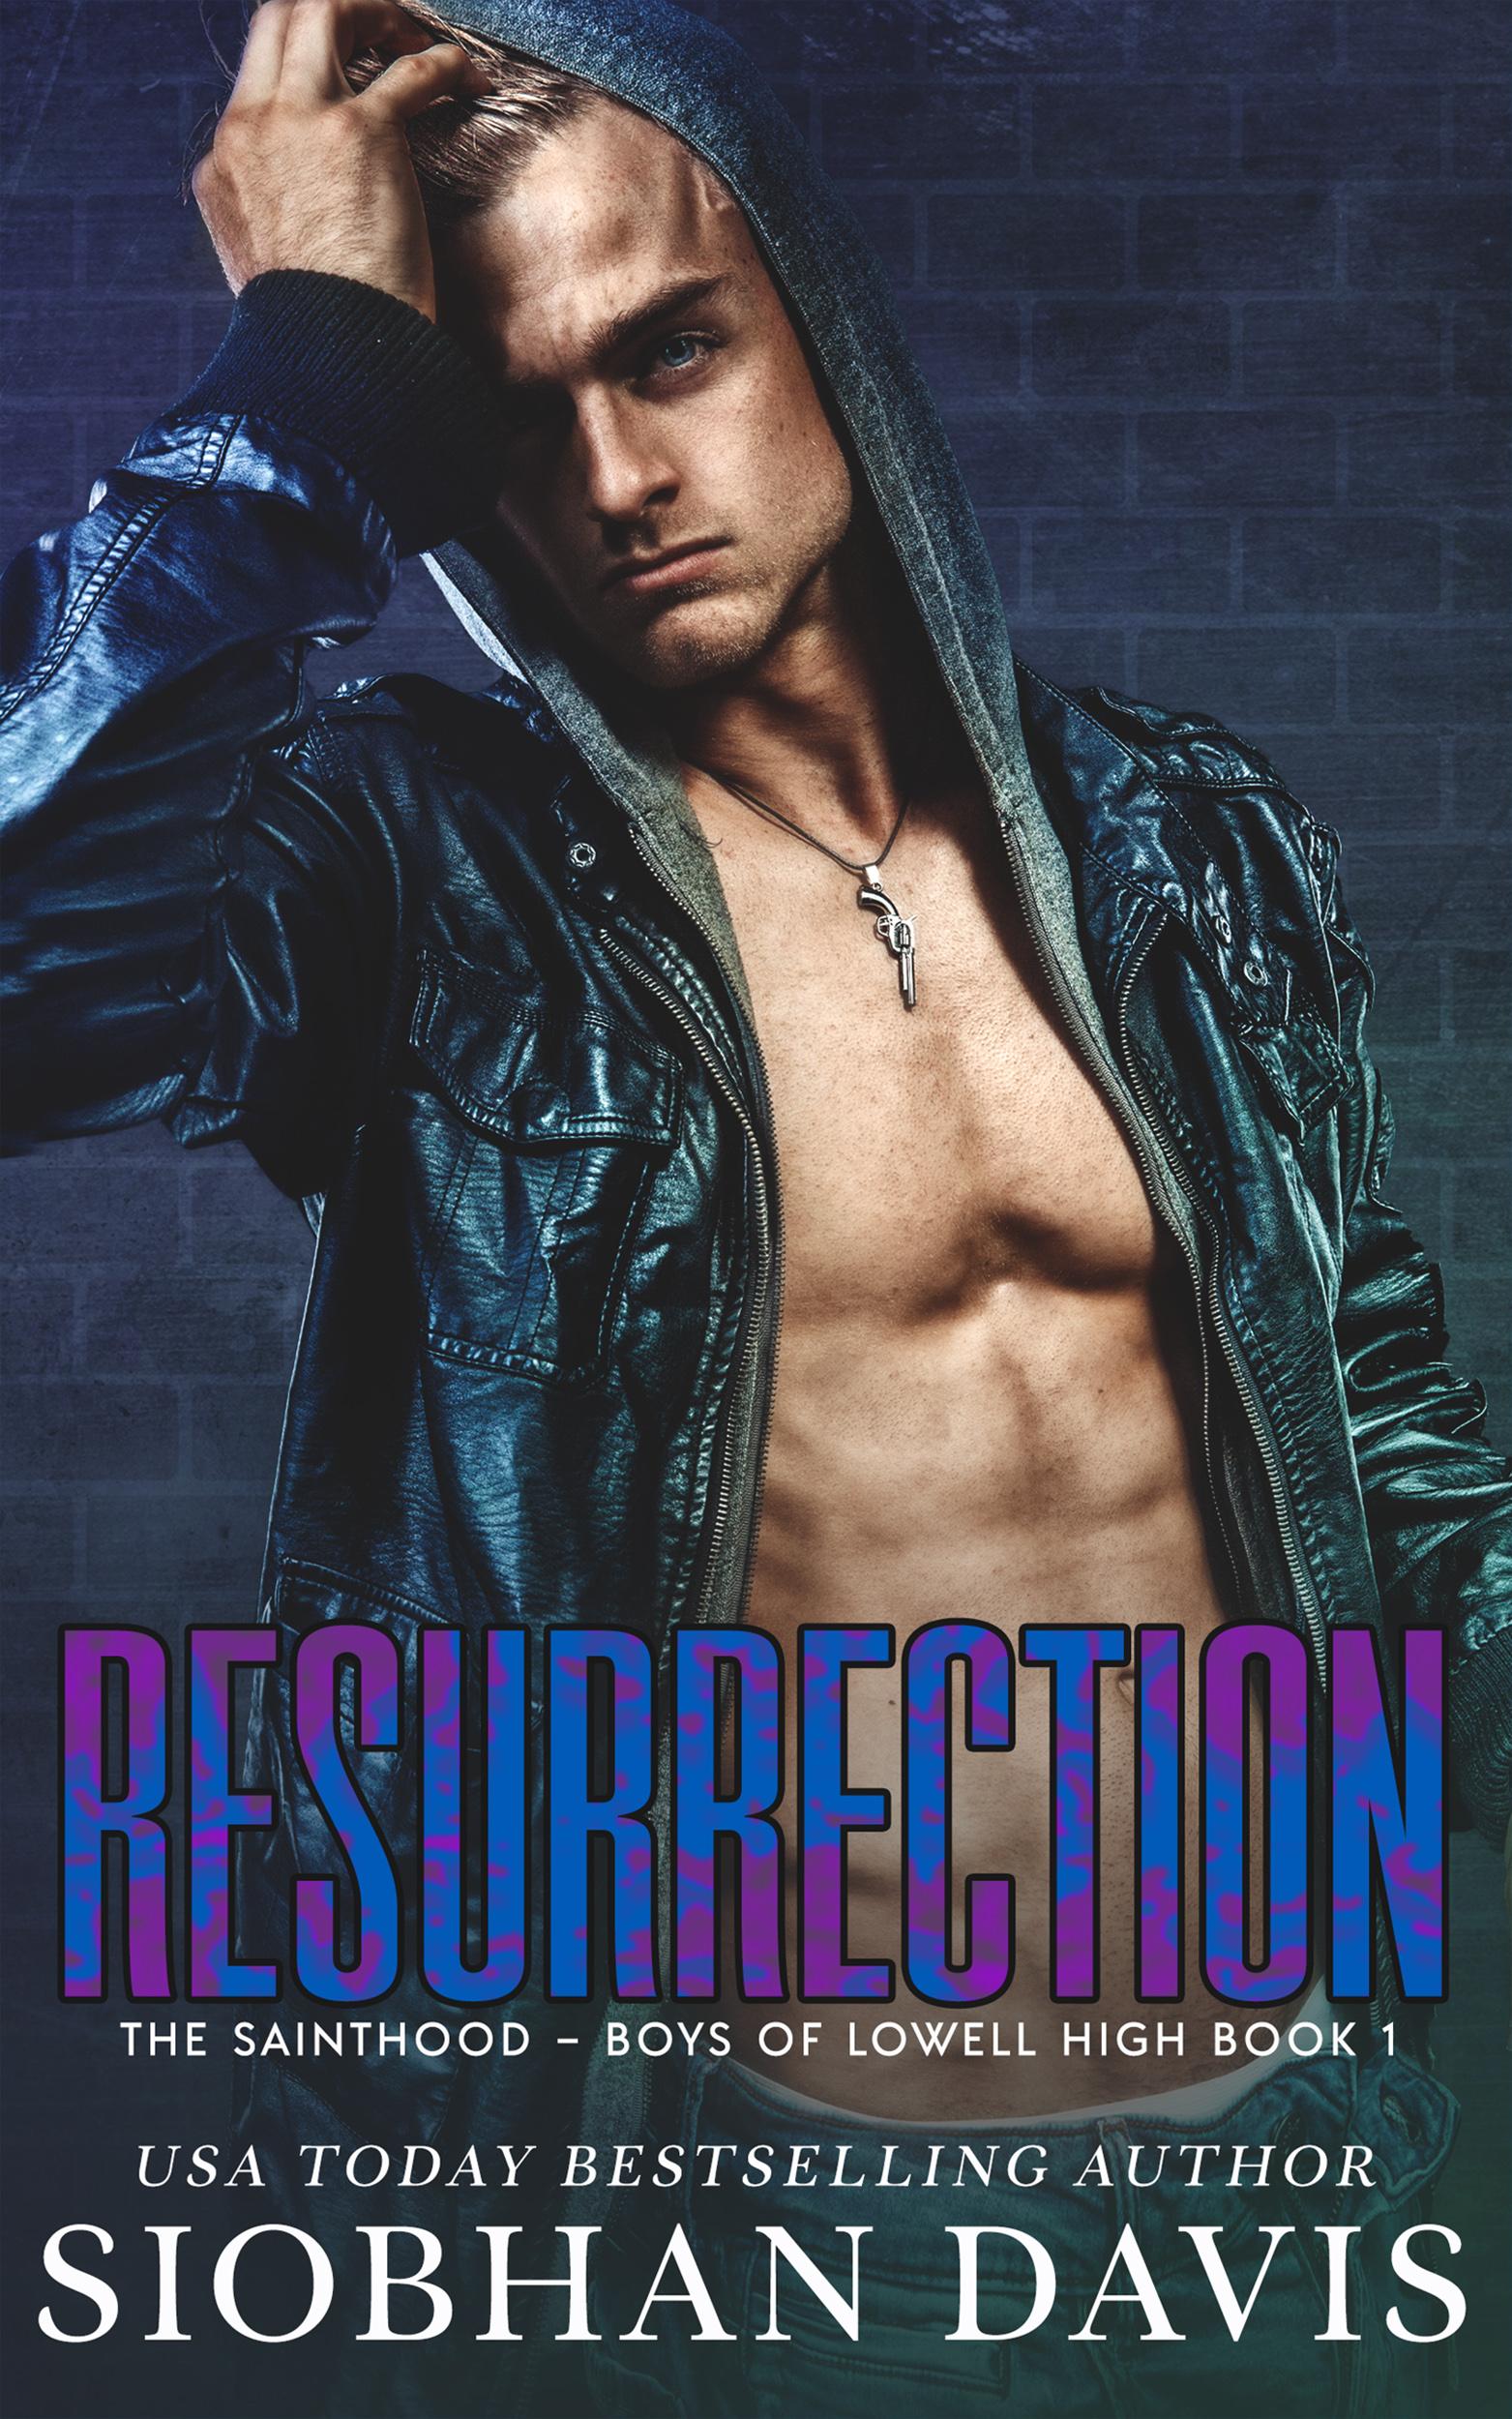 Resurrection (The Sainthood - Boys of Lowell High #1)